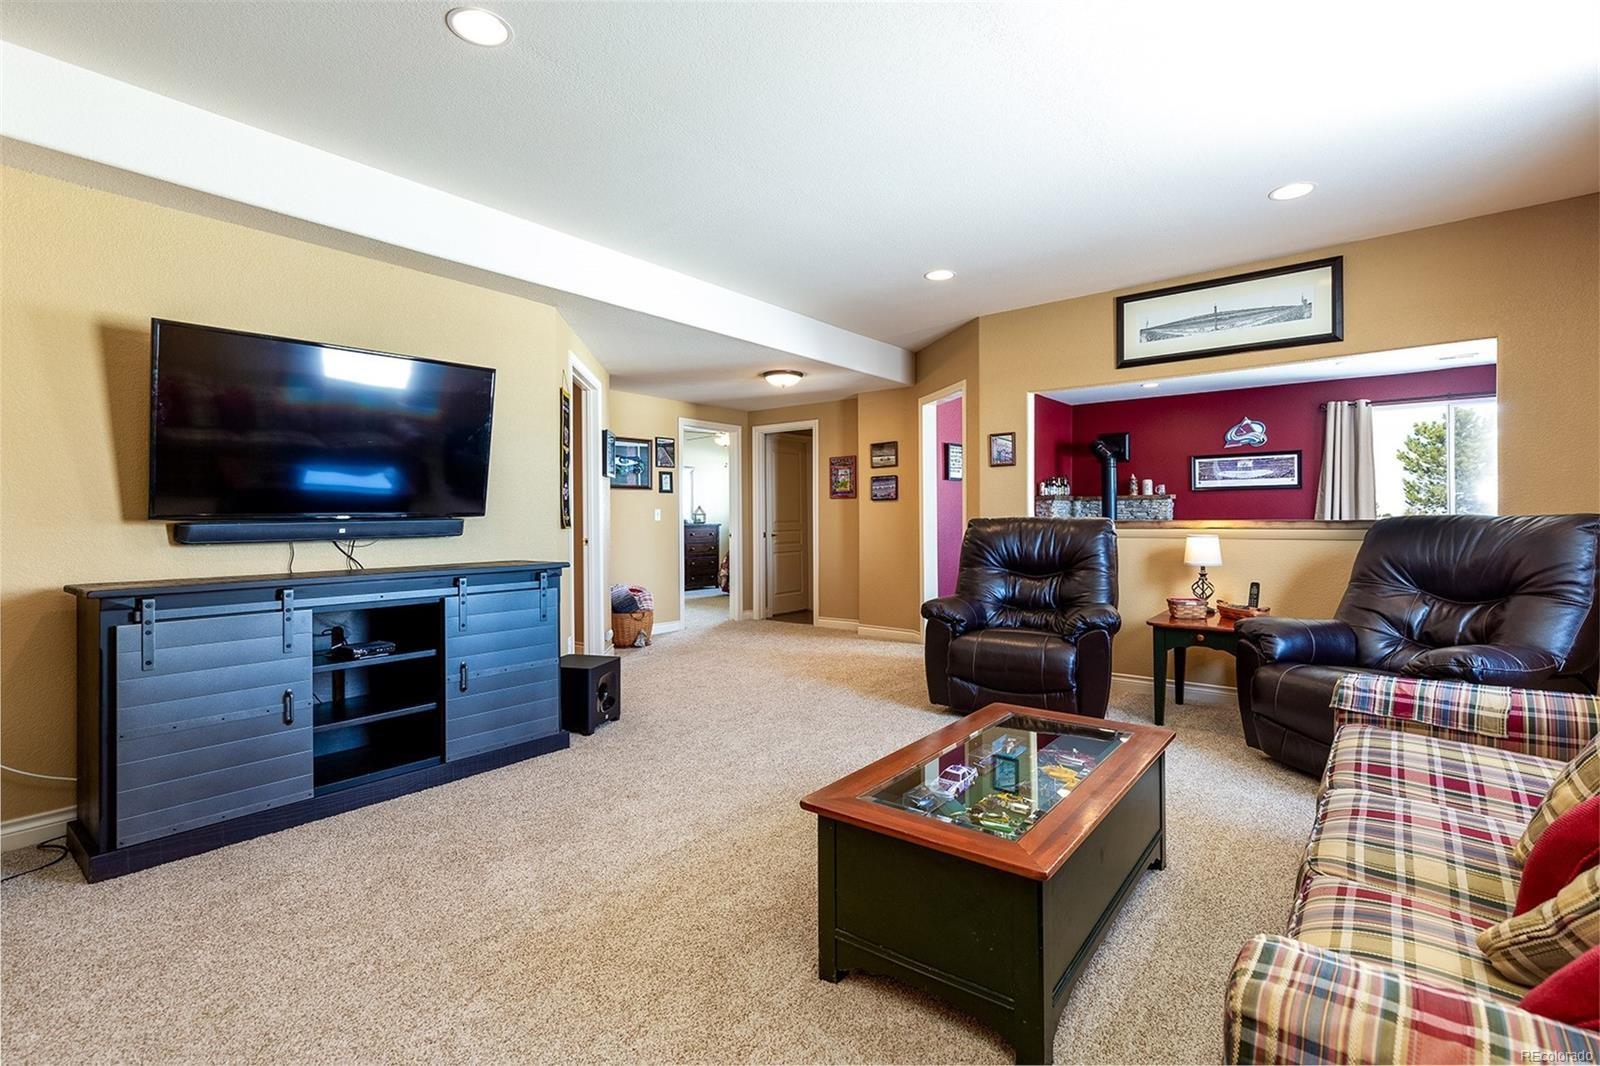 MLS# 4807349 - 24 - 15325 Terra Ridge Circle, Colorado Springs, CO 80908